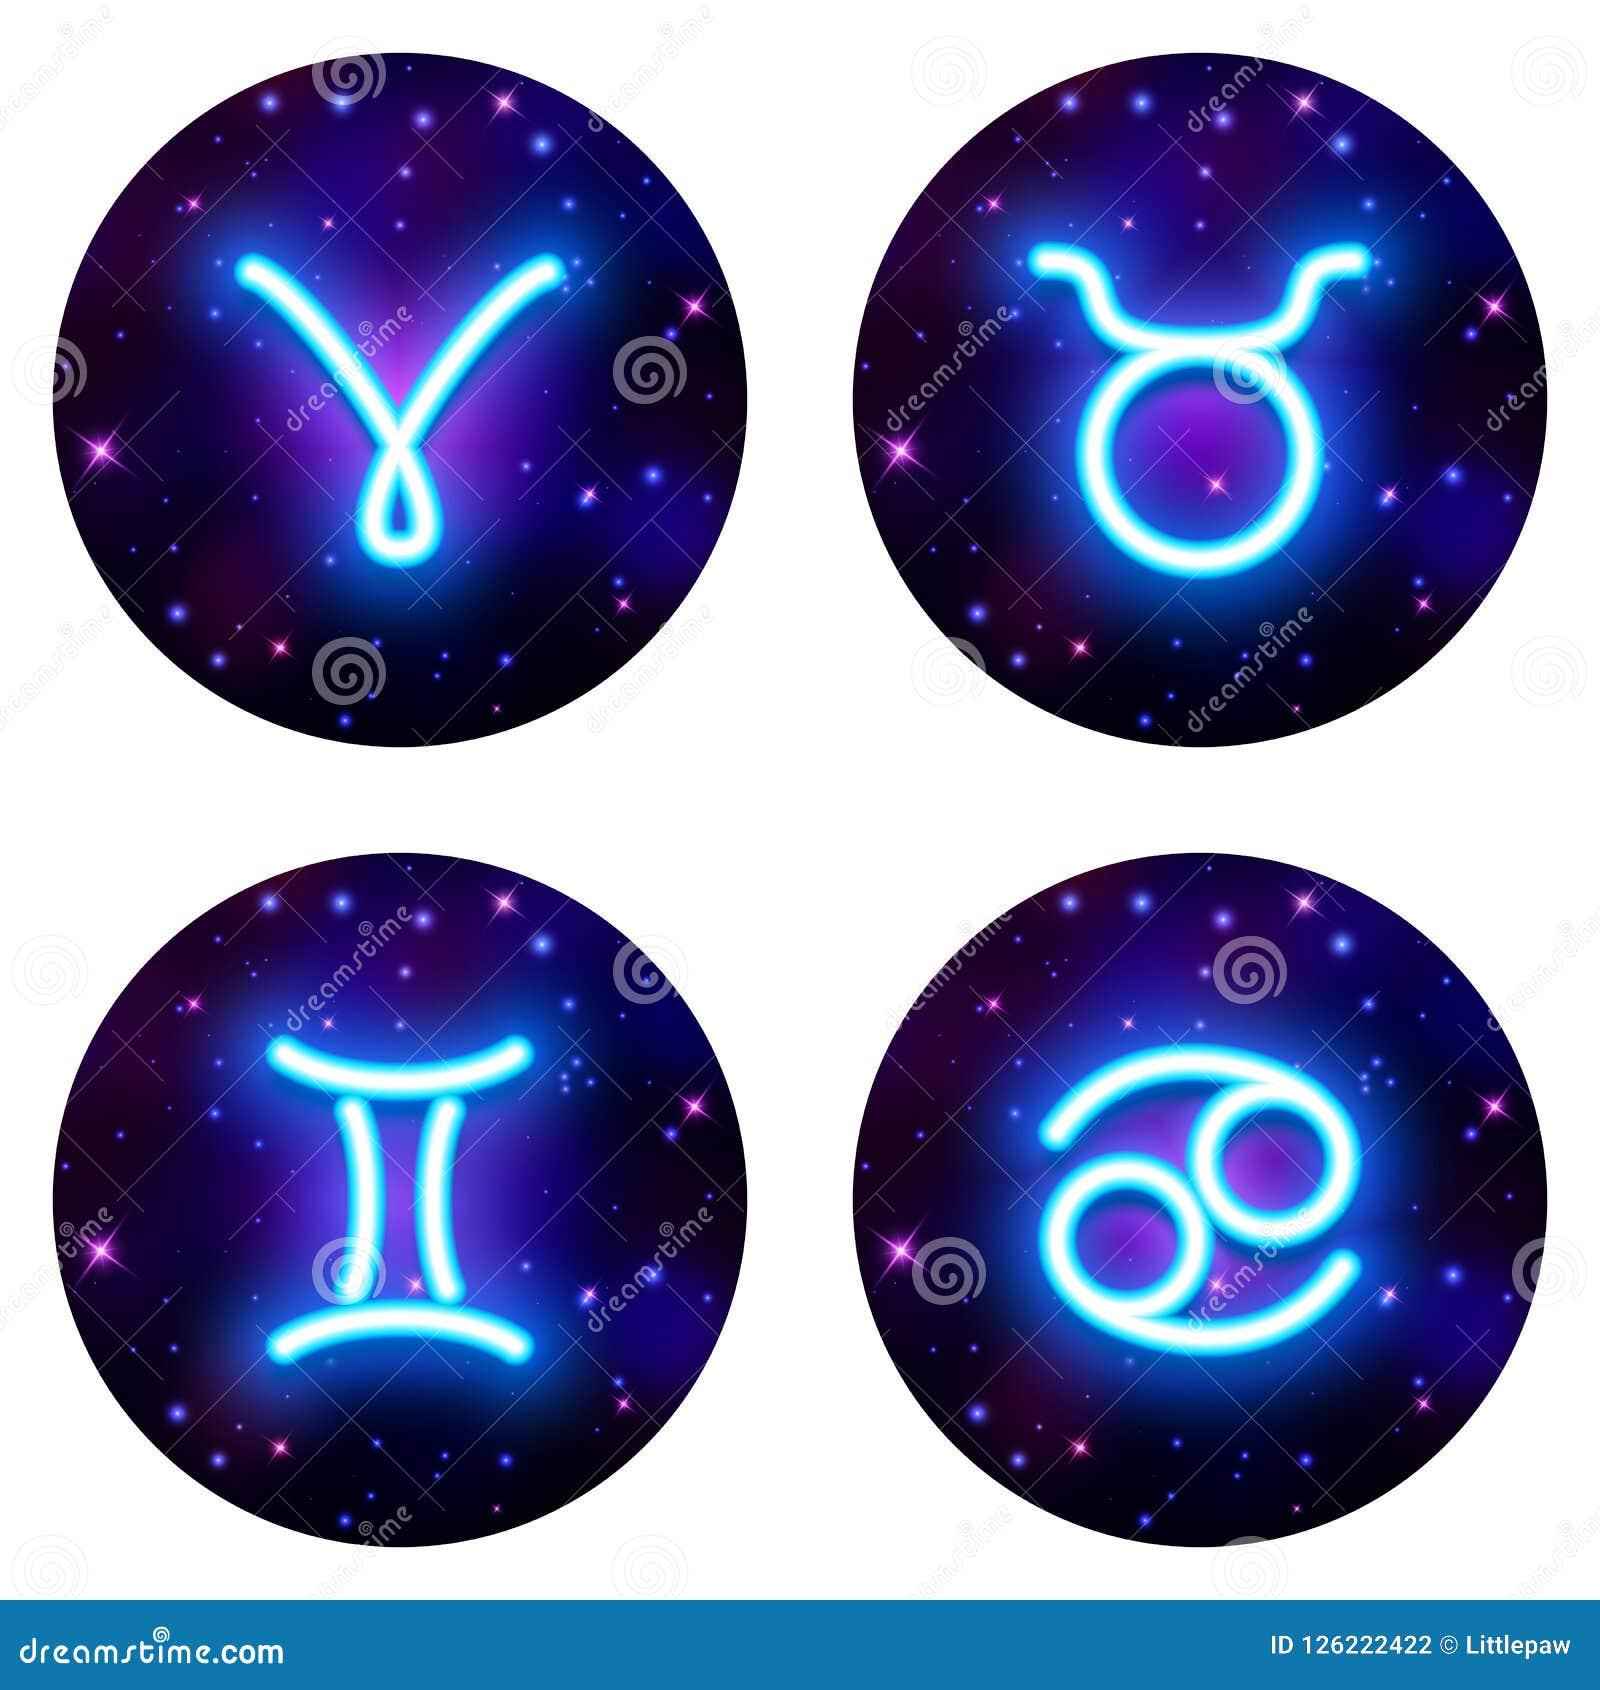 Aries Taurus Gemini Cancer Zodiac Sign Horoscope Symbol Vec